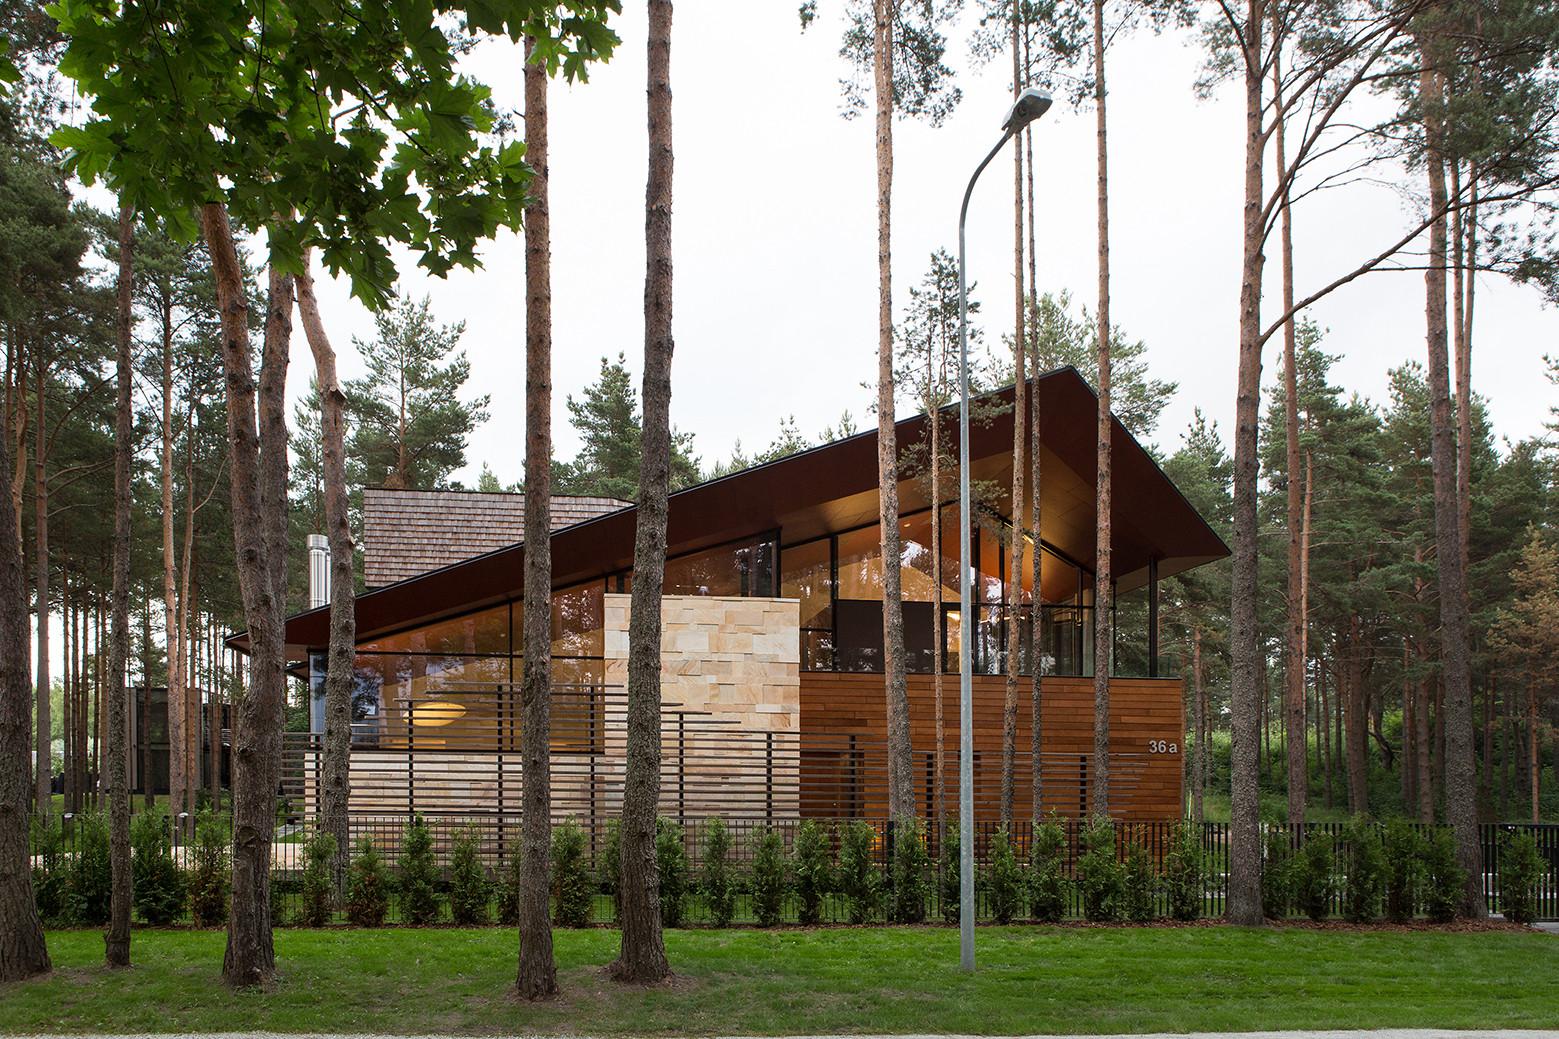 Flügel Haus / Arch-D, Courtesy of Arch-D